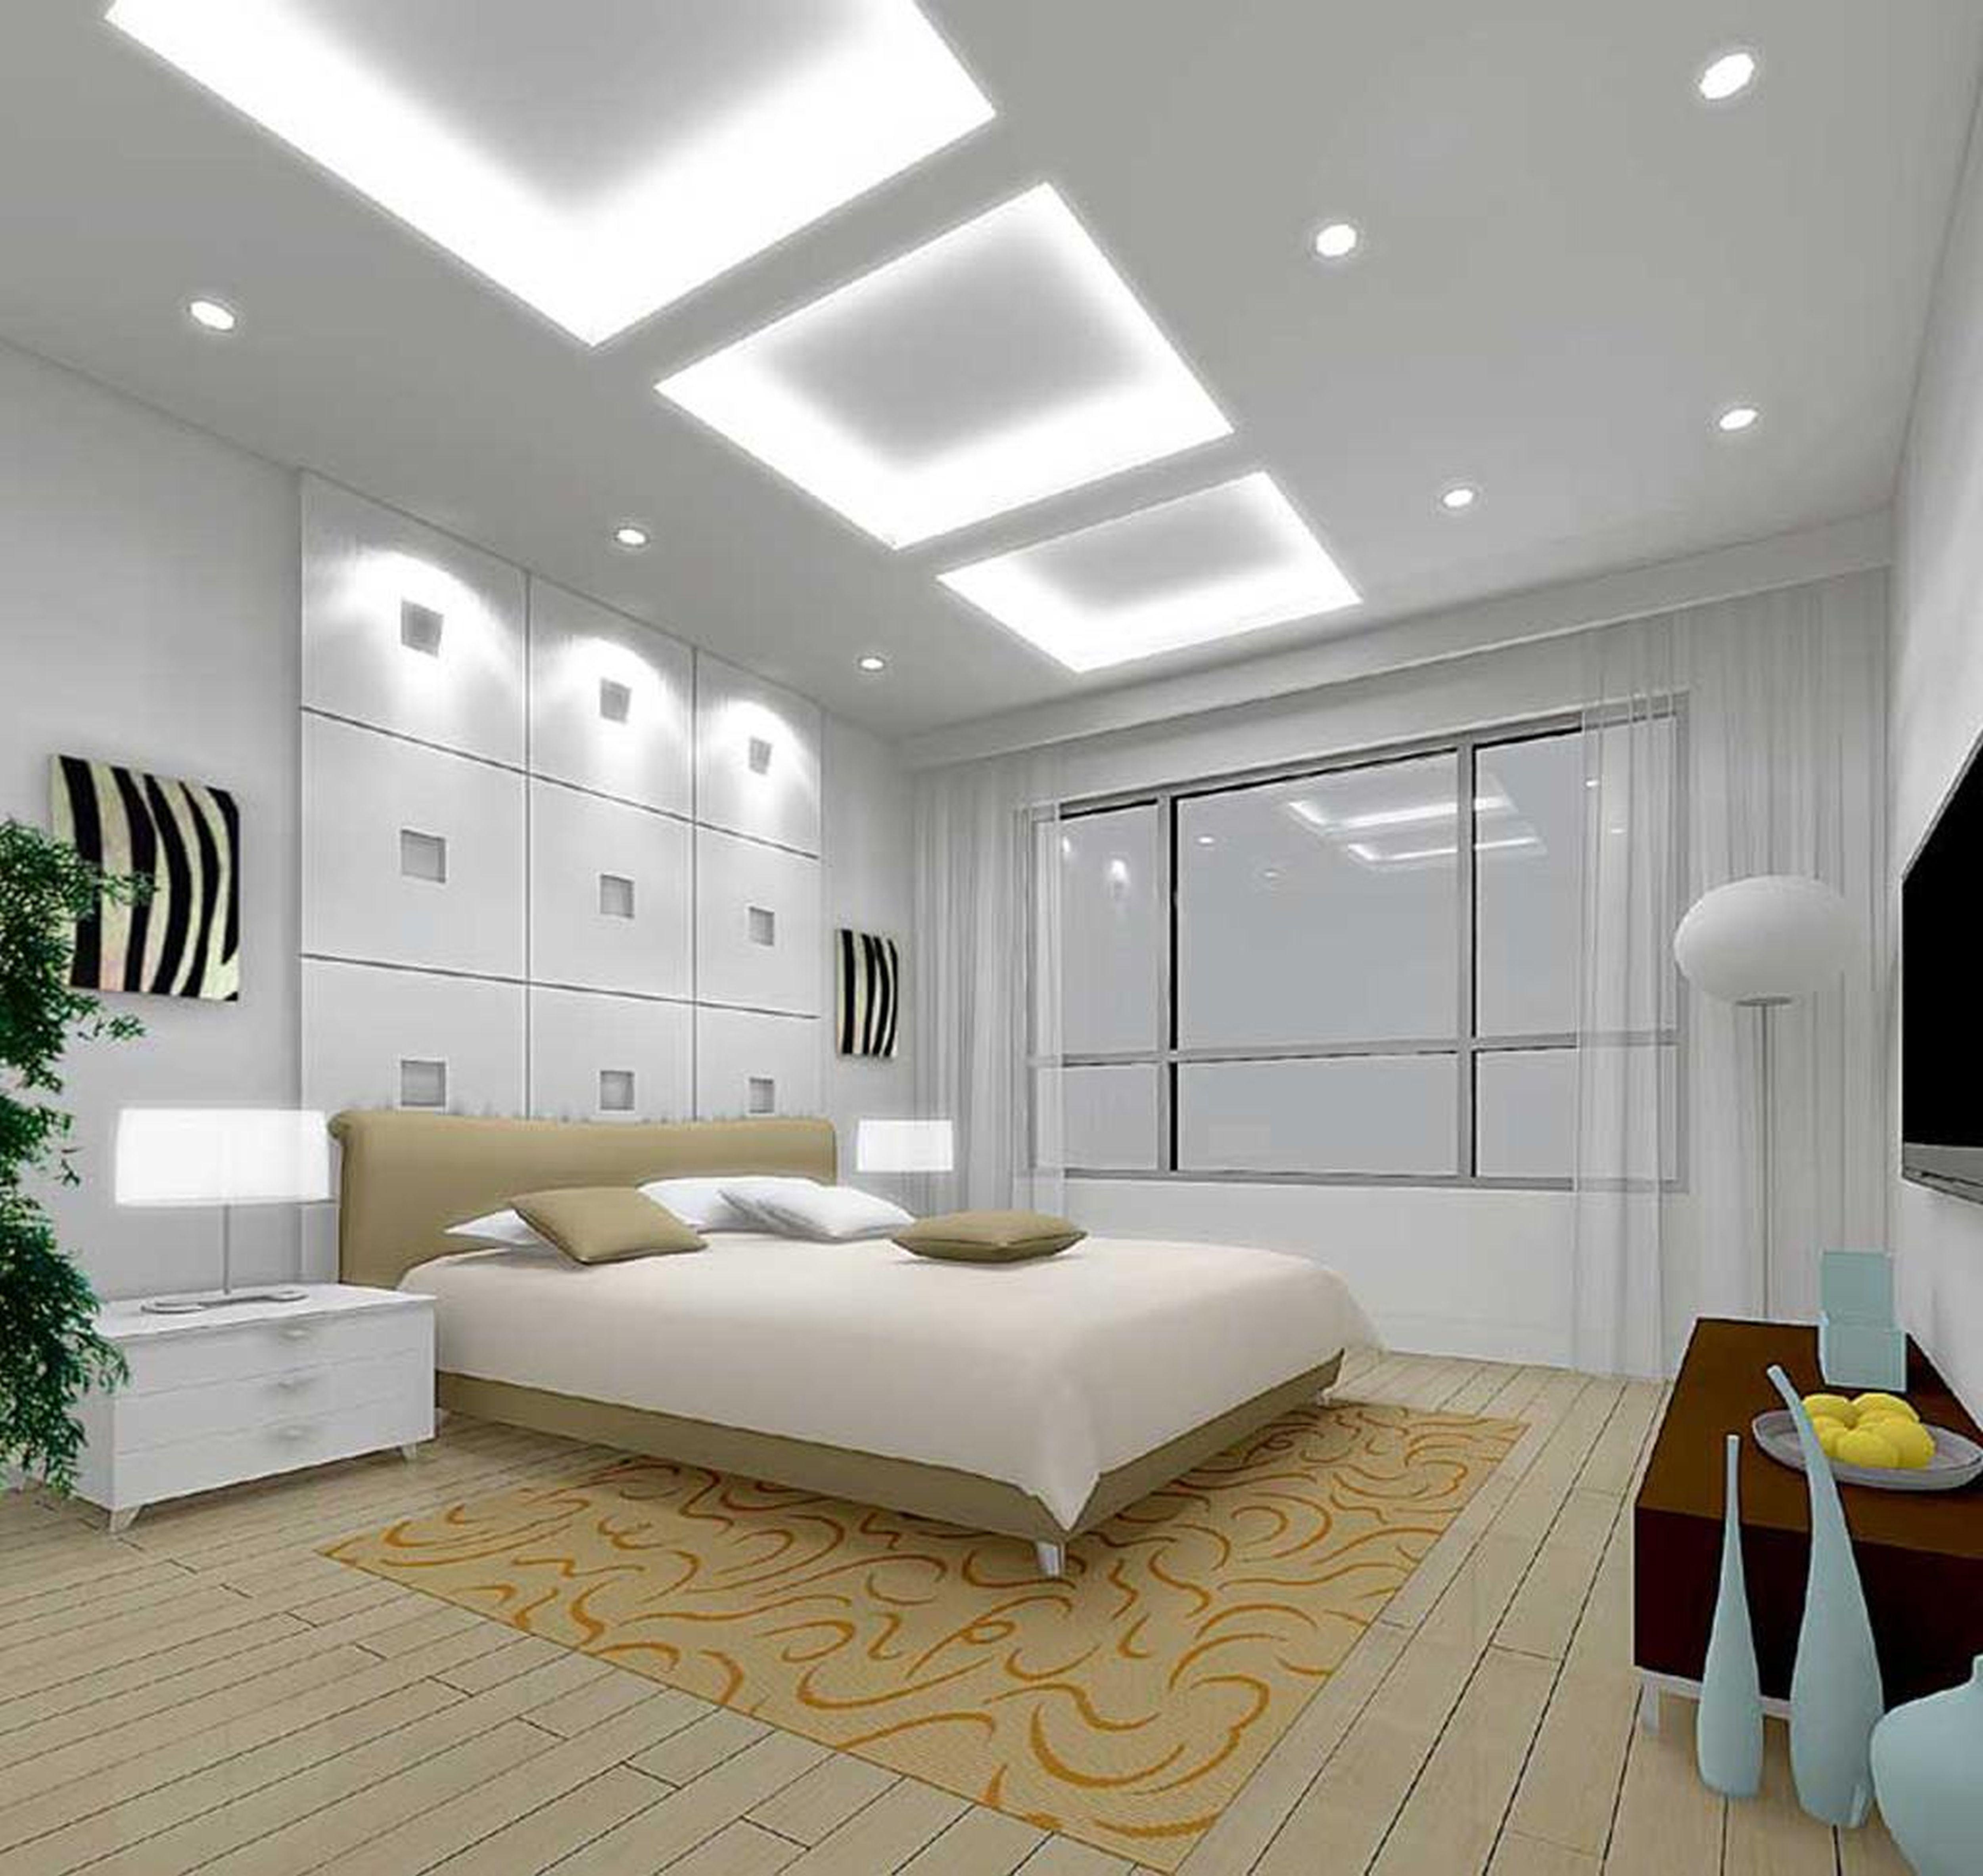 dormitorio con